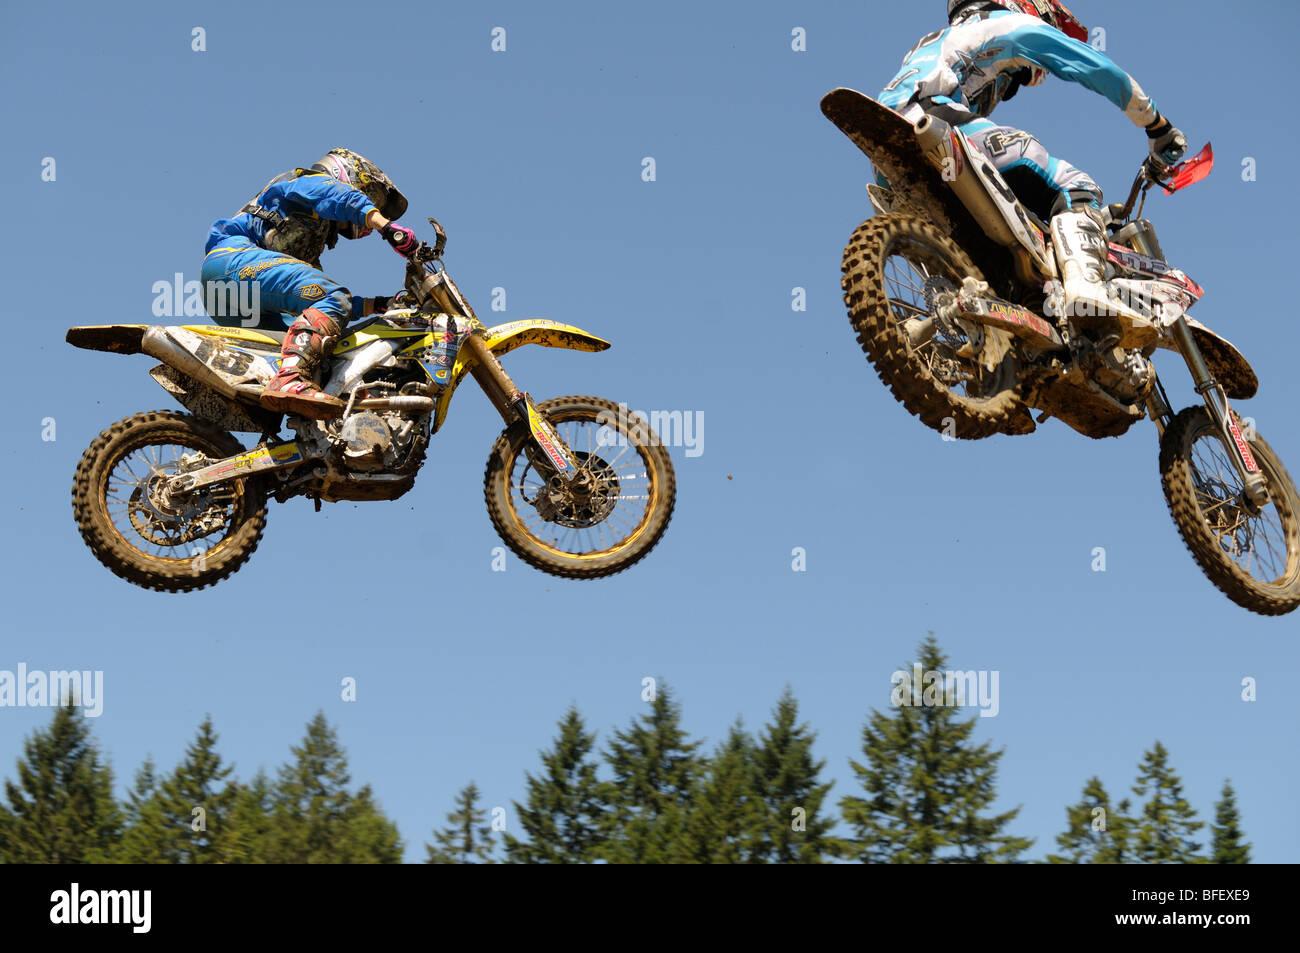 Tyler Medaglia - Monster Energy Motocross Nationals - MX1 Pro Moto 1 - Nanaimo Wastelands, July 13, 2008. - Stock Image